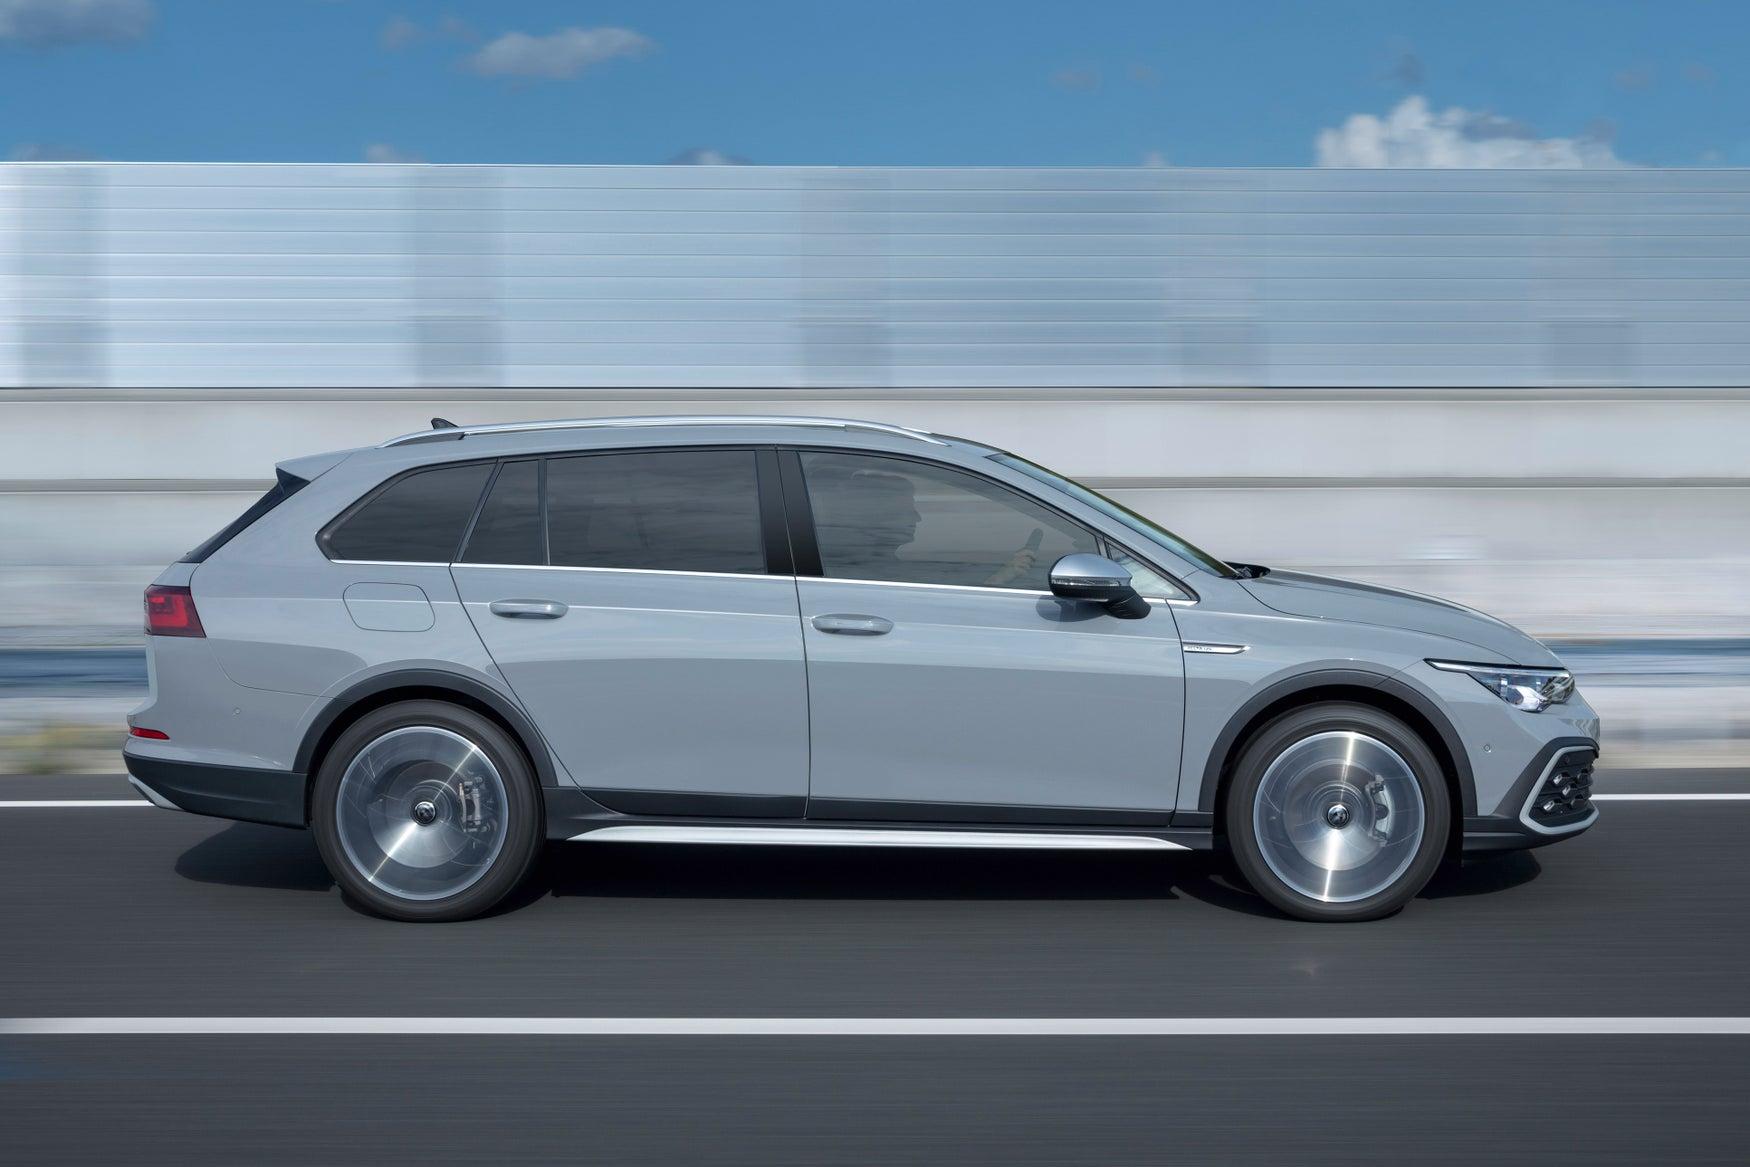 Volkswagen Golf Alltrack grey exterior side profile dynamic